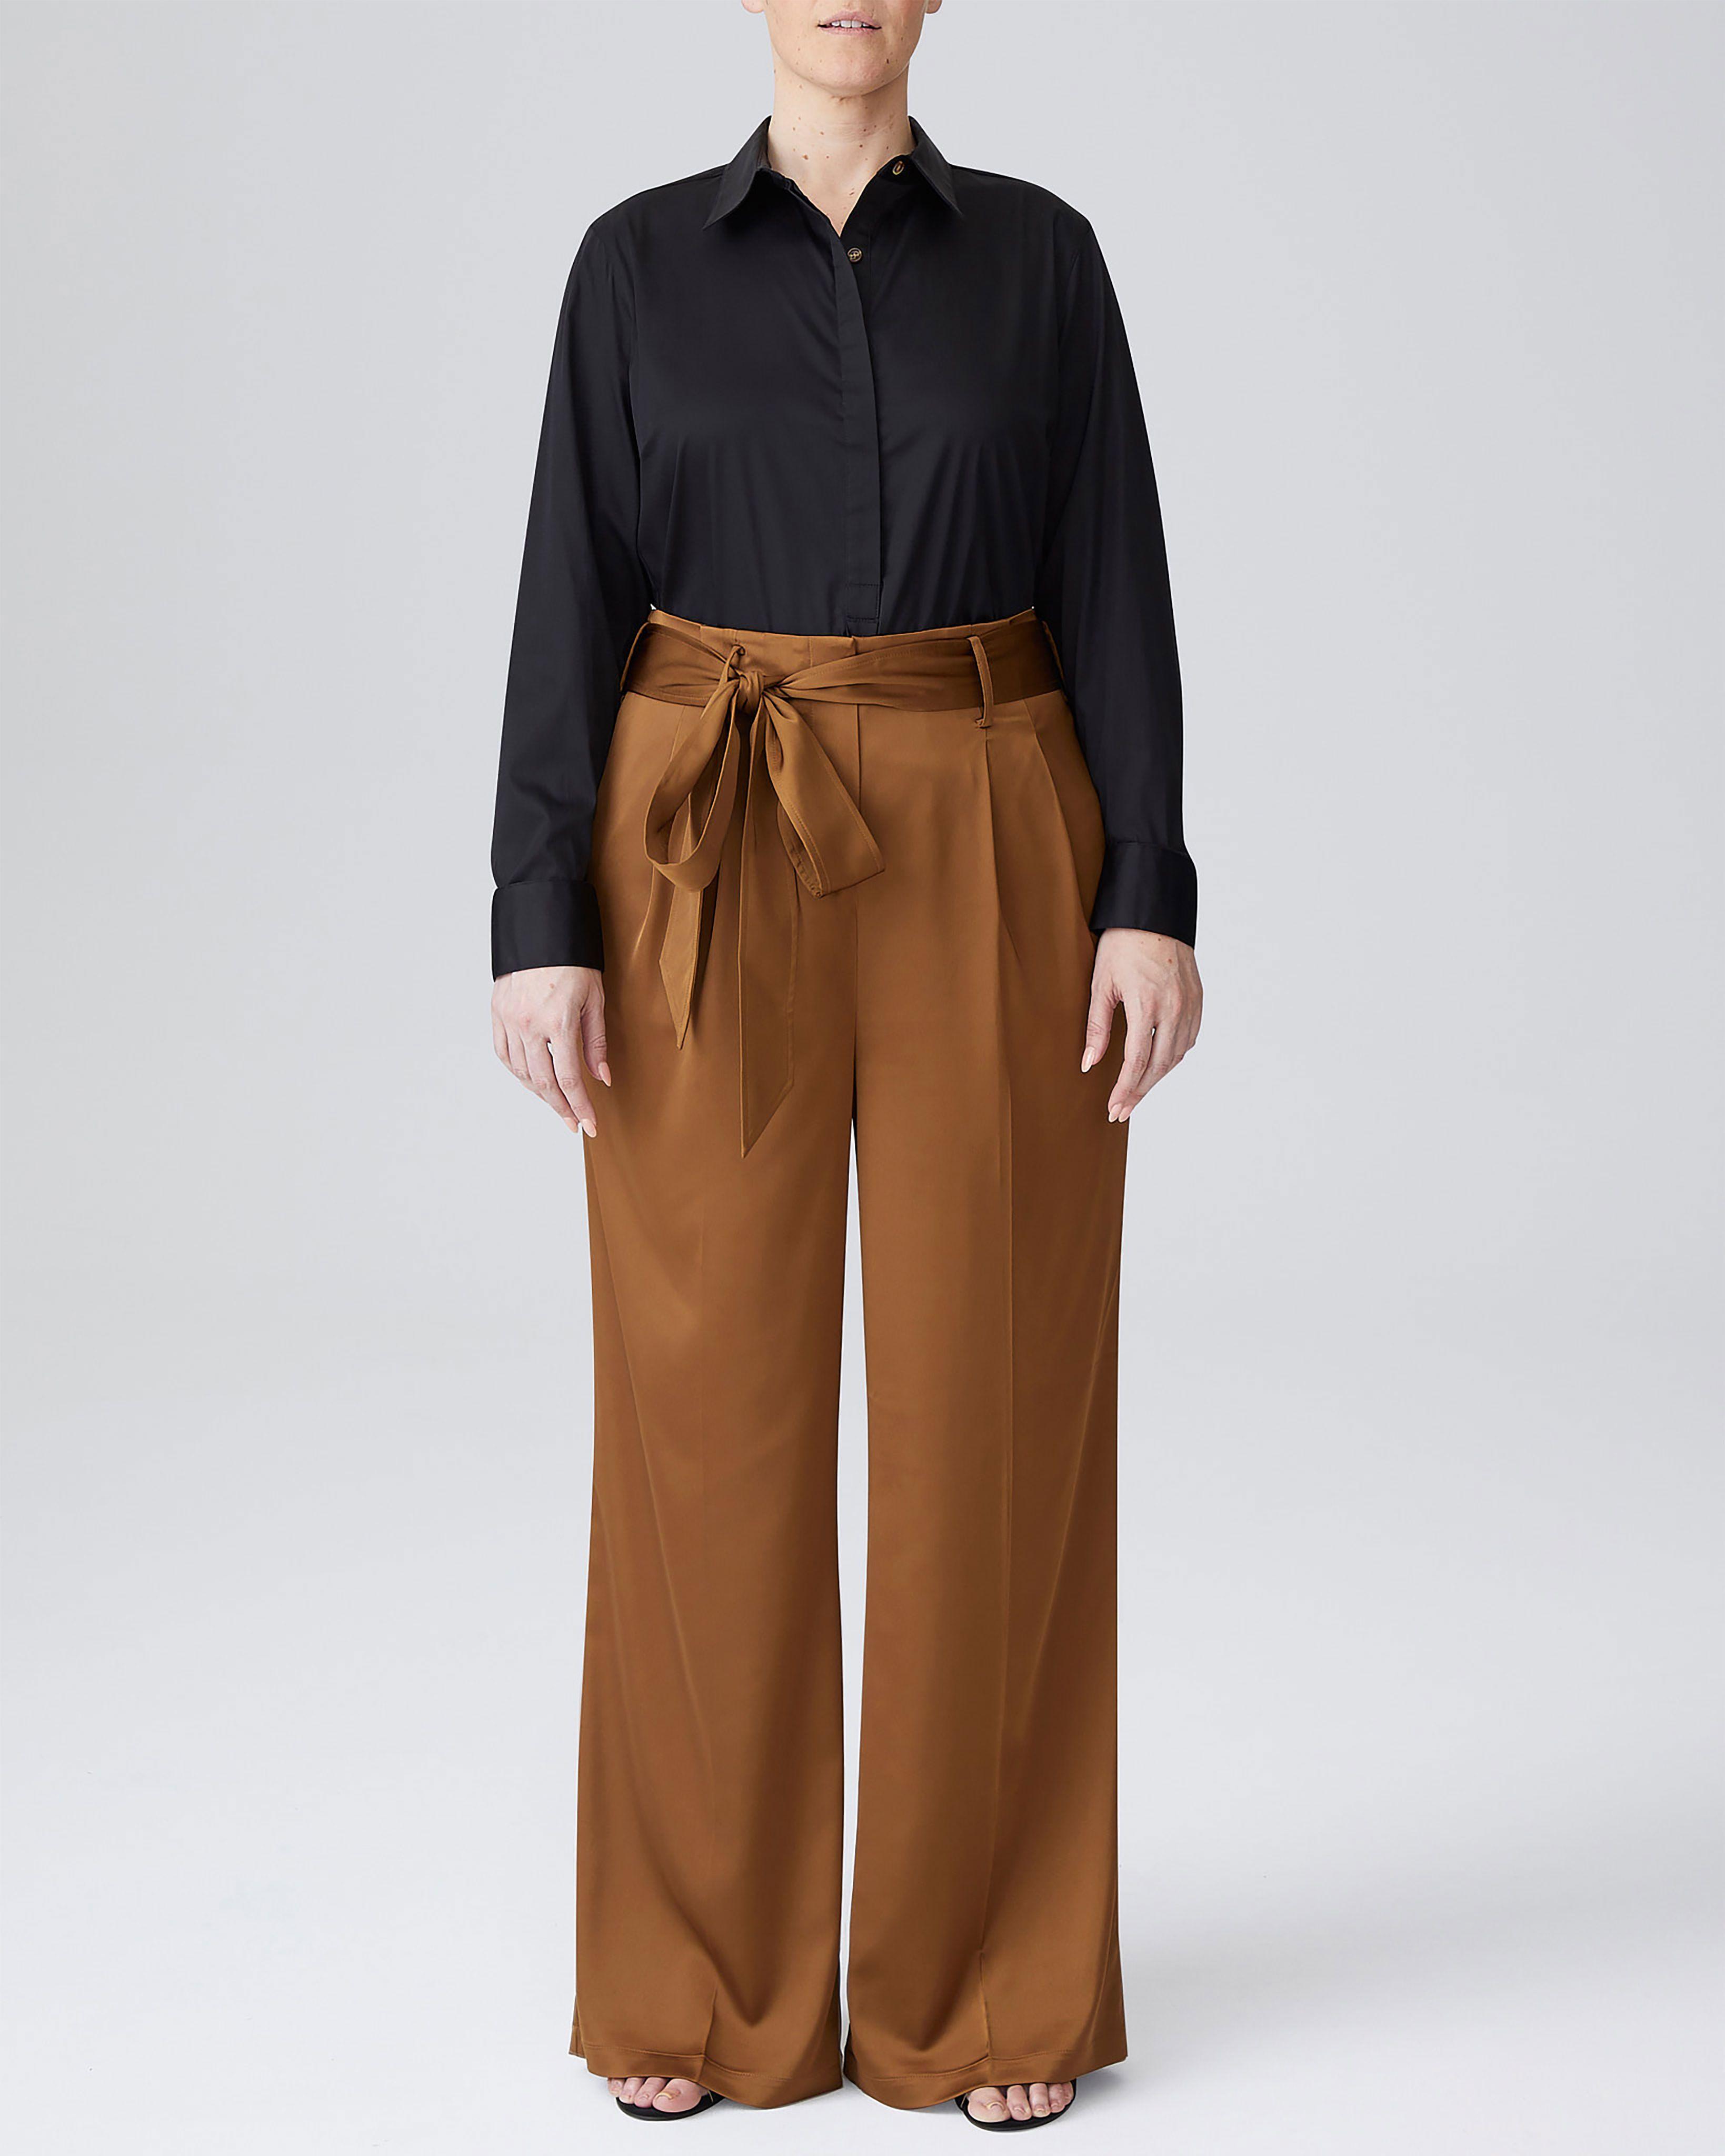 Tresa Wide Leg Tie Pants - Navy